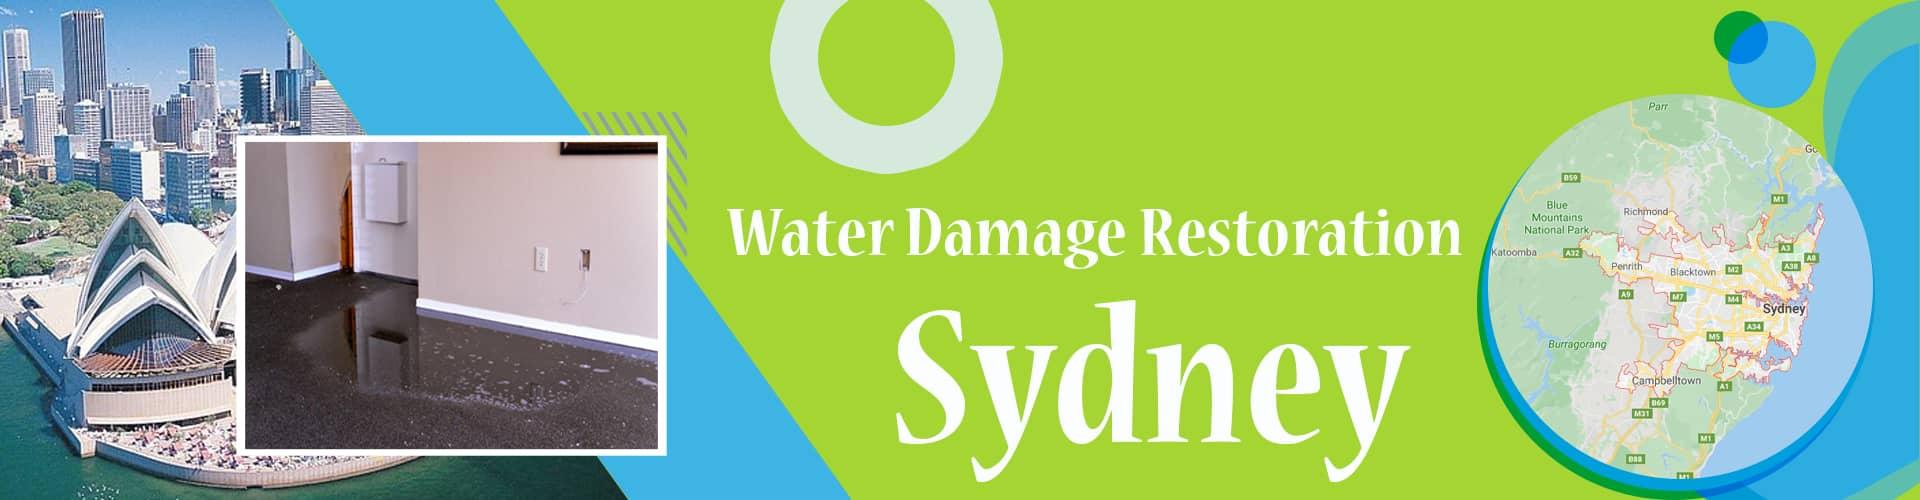 Water Damage Restoration Sydney